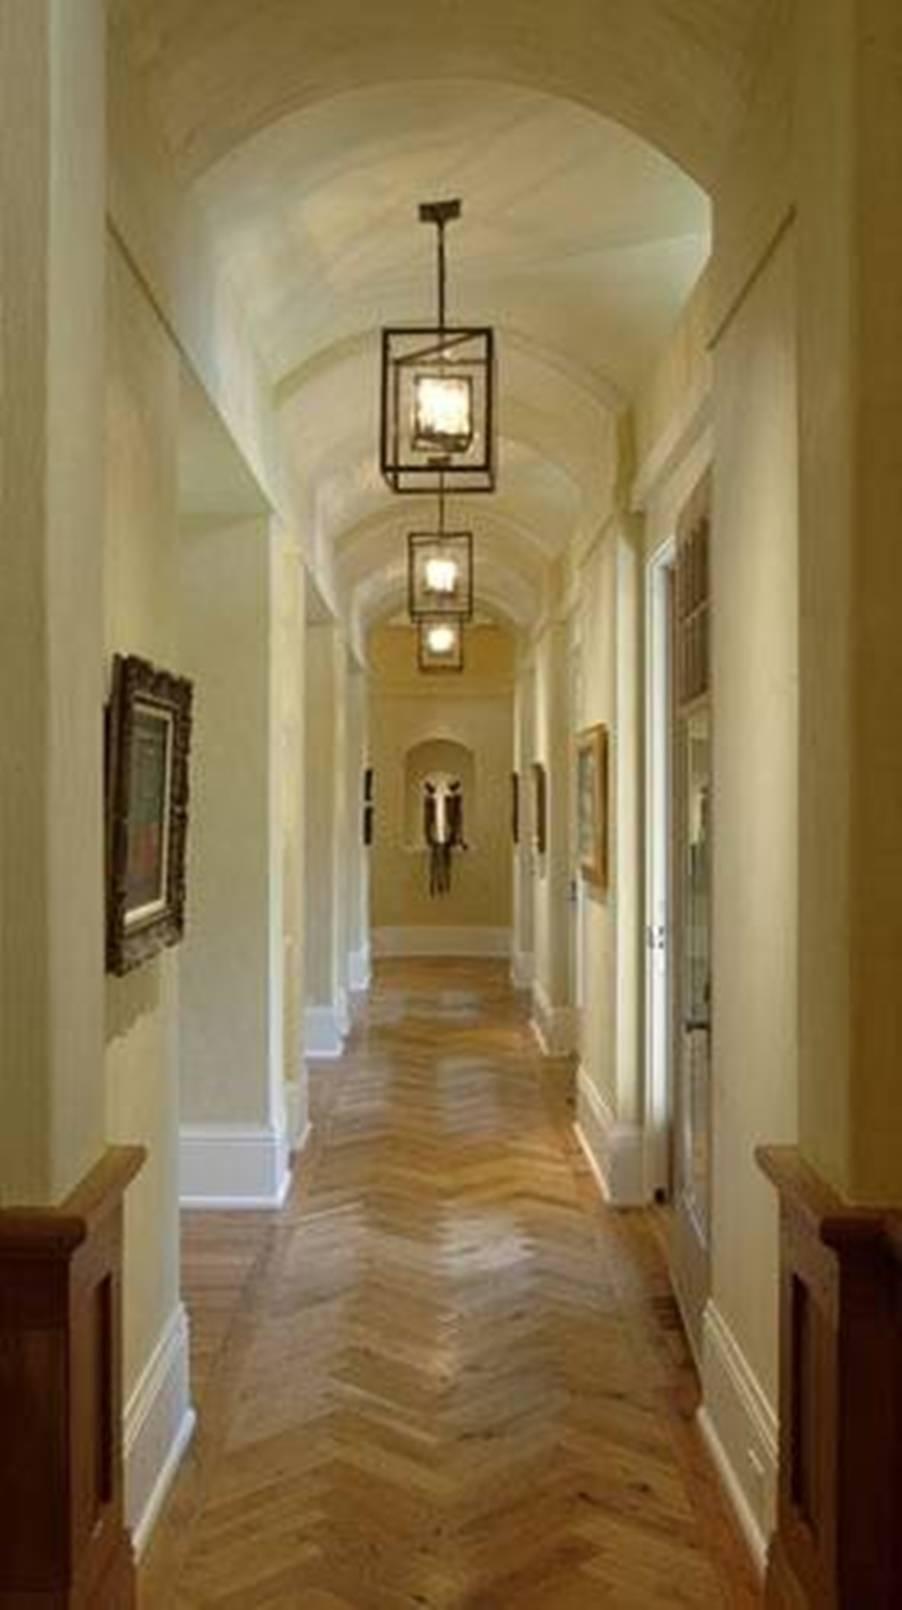 Wonderful Hallway Light Fixtures | Tedxumkc Decoration pertaining to Entry Hall Pendant Lighting (Image 14 of 15)